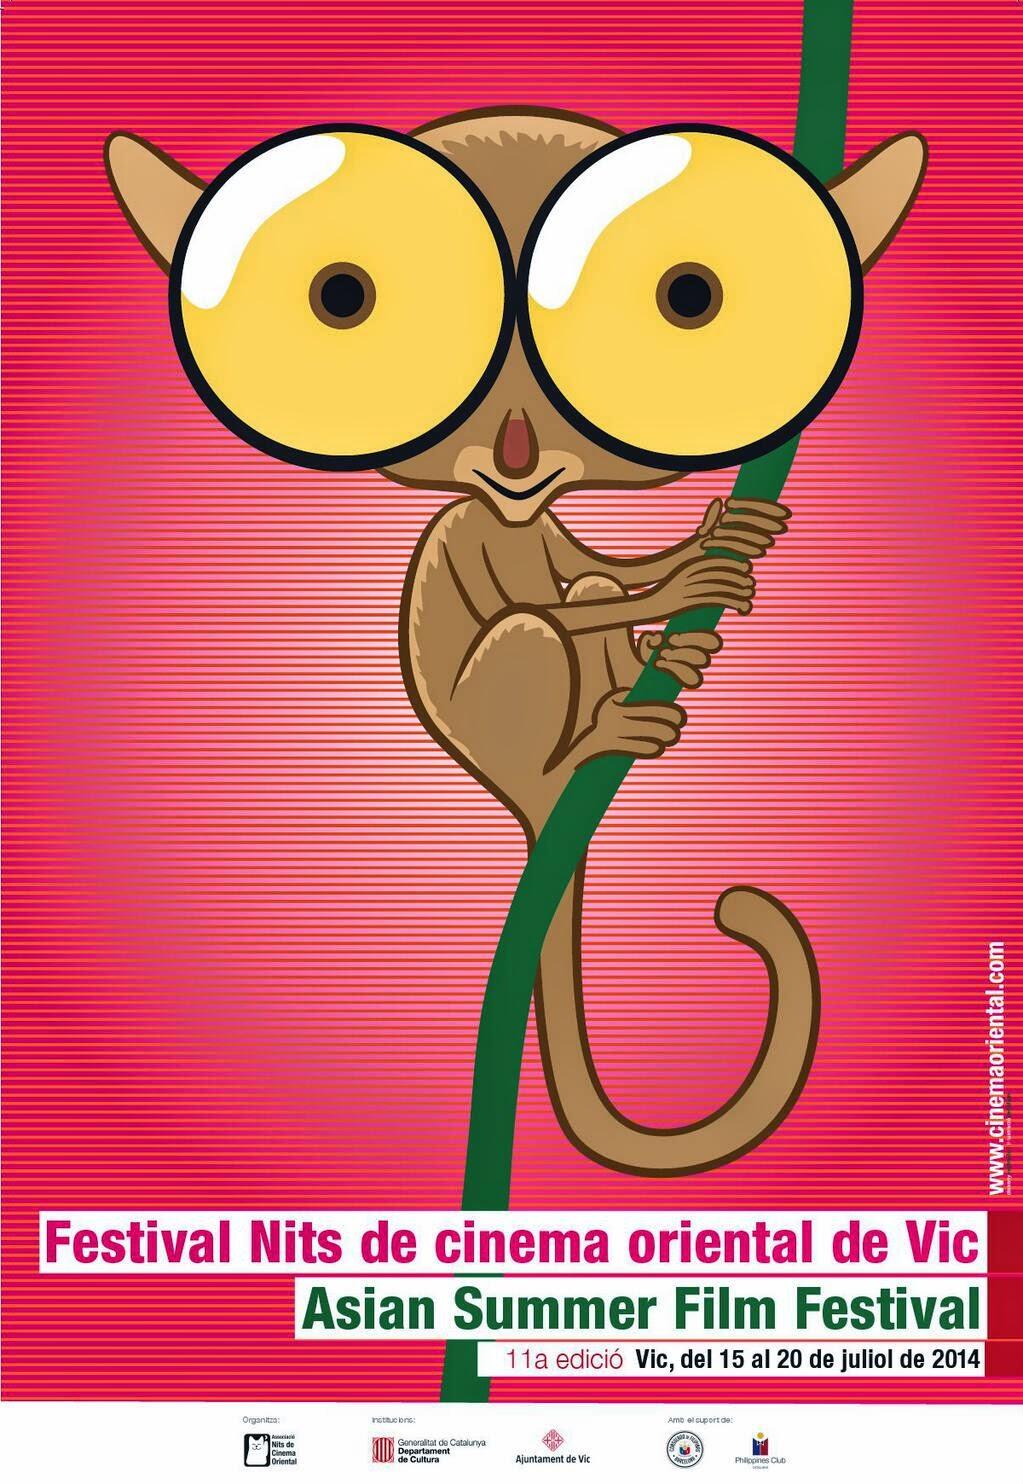 festival nits 2014